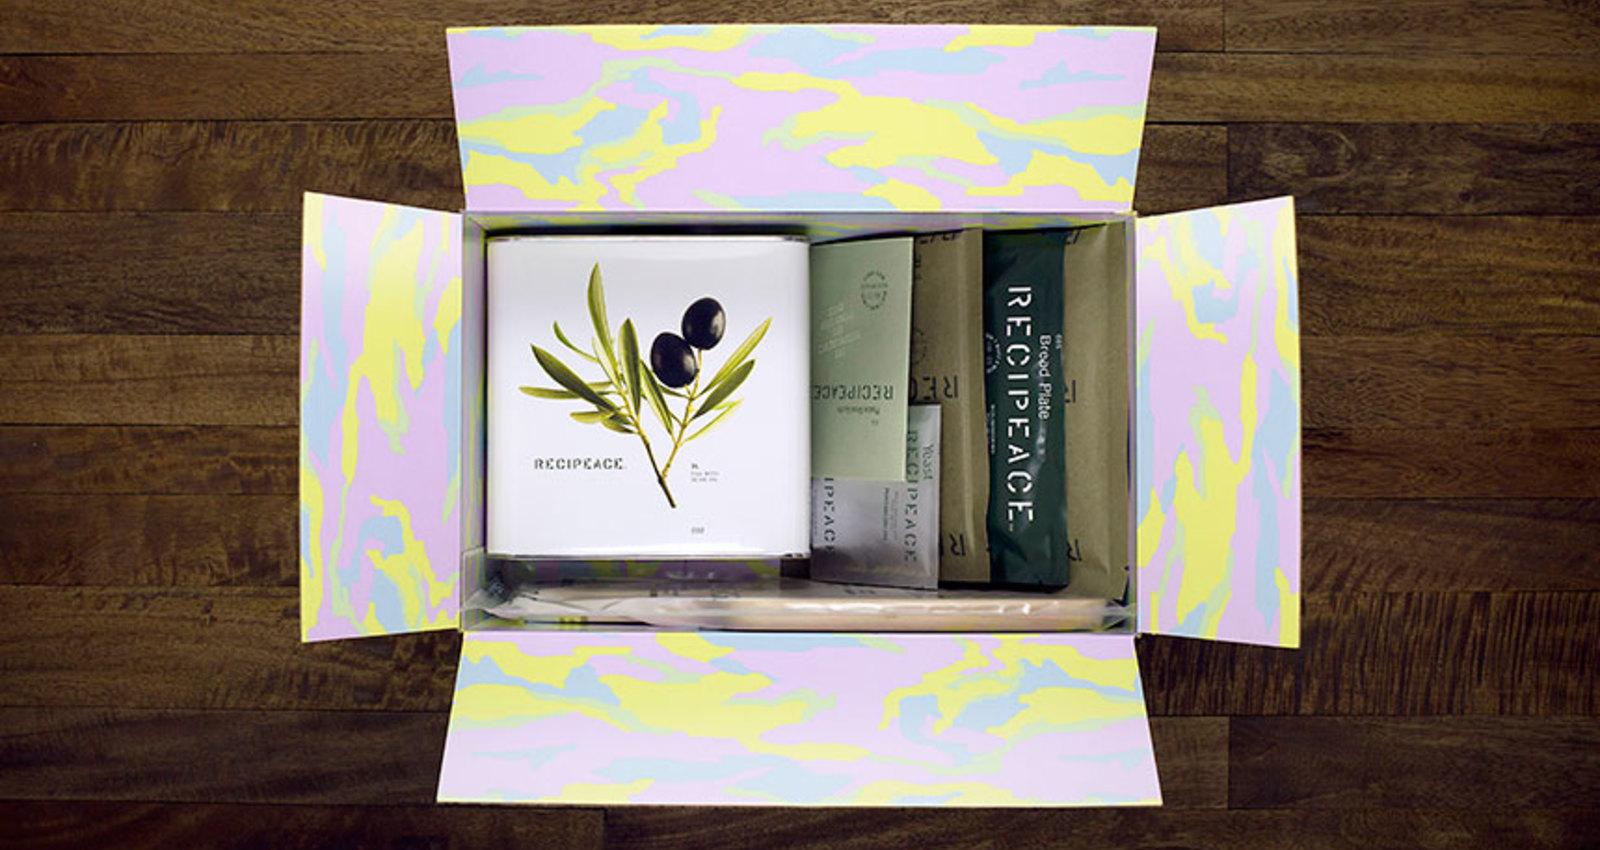 Recipeace Peace Kit